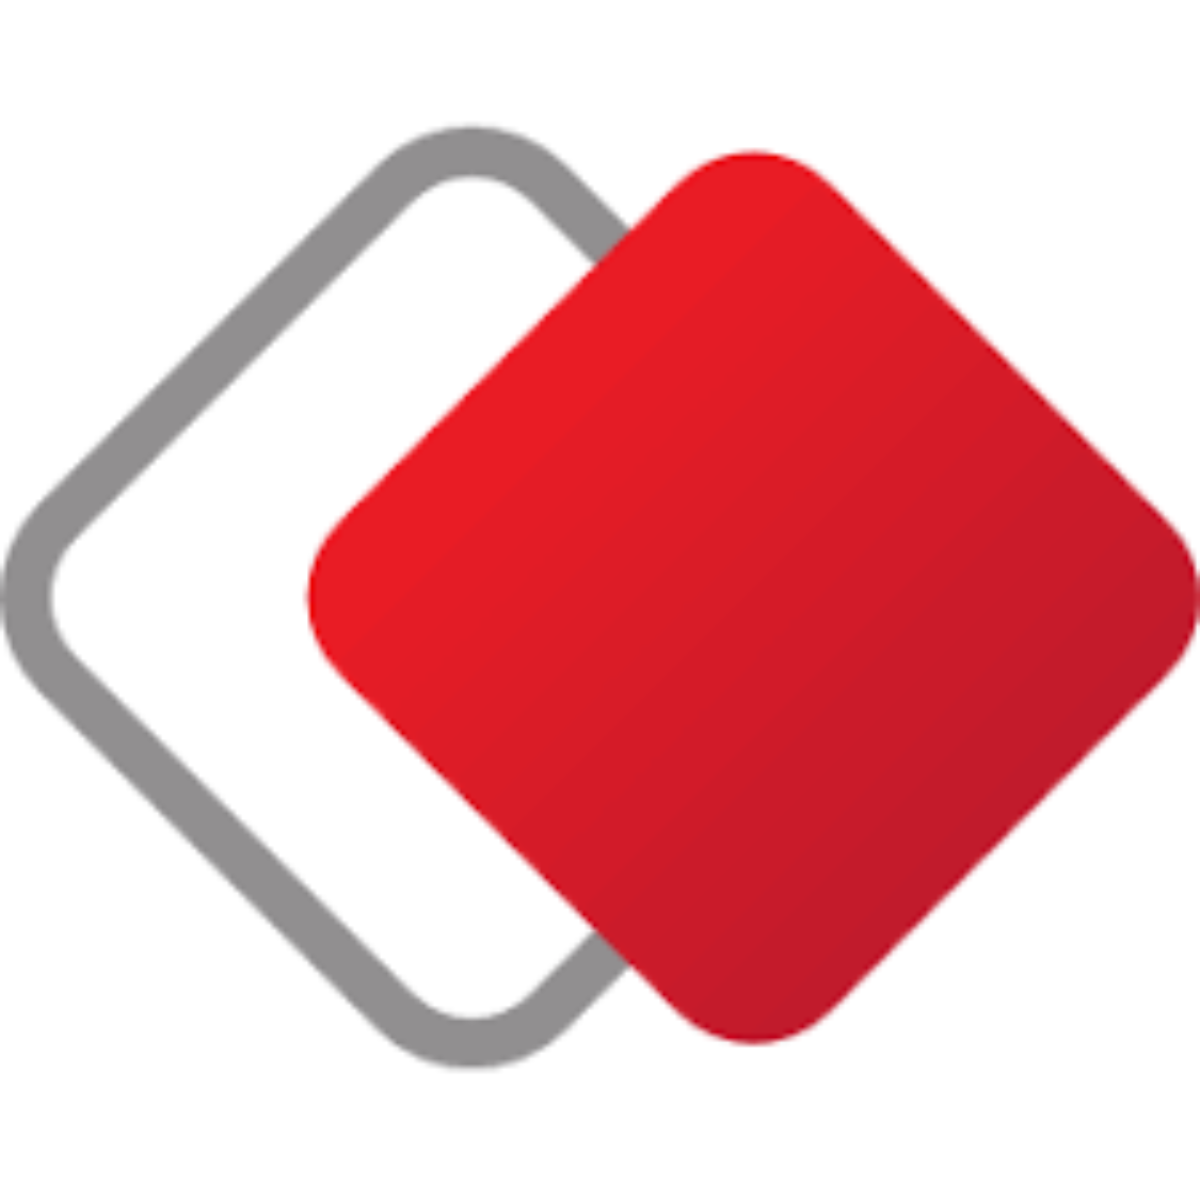 AnyDesk 5.4.2 Crack + Premium License Key Full Version 2020